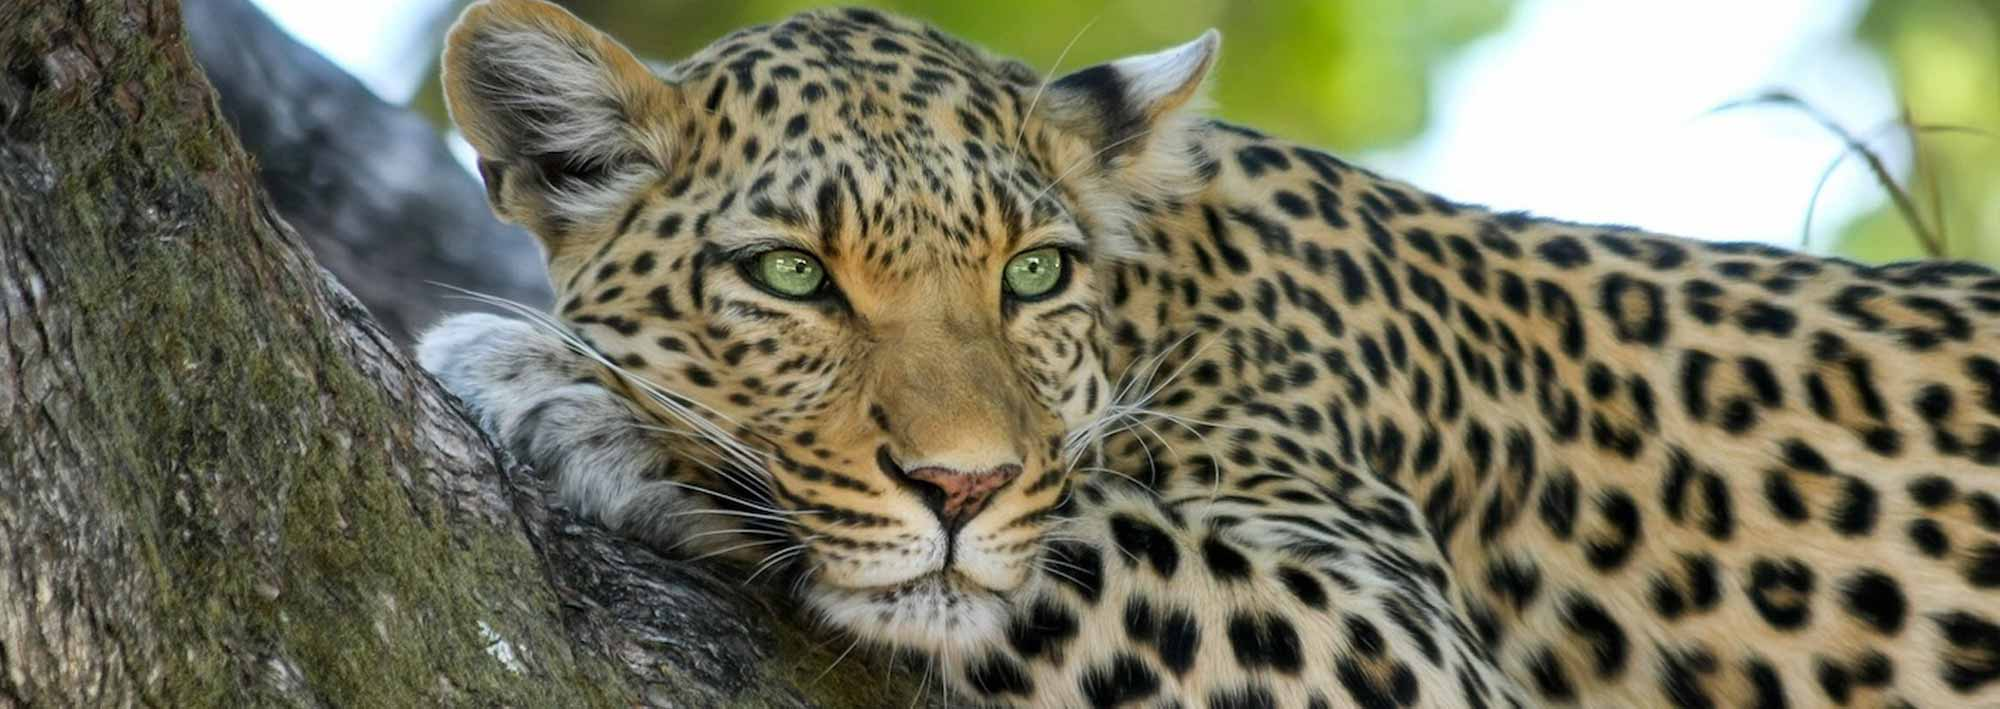 safari-header